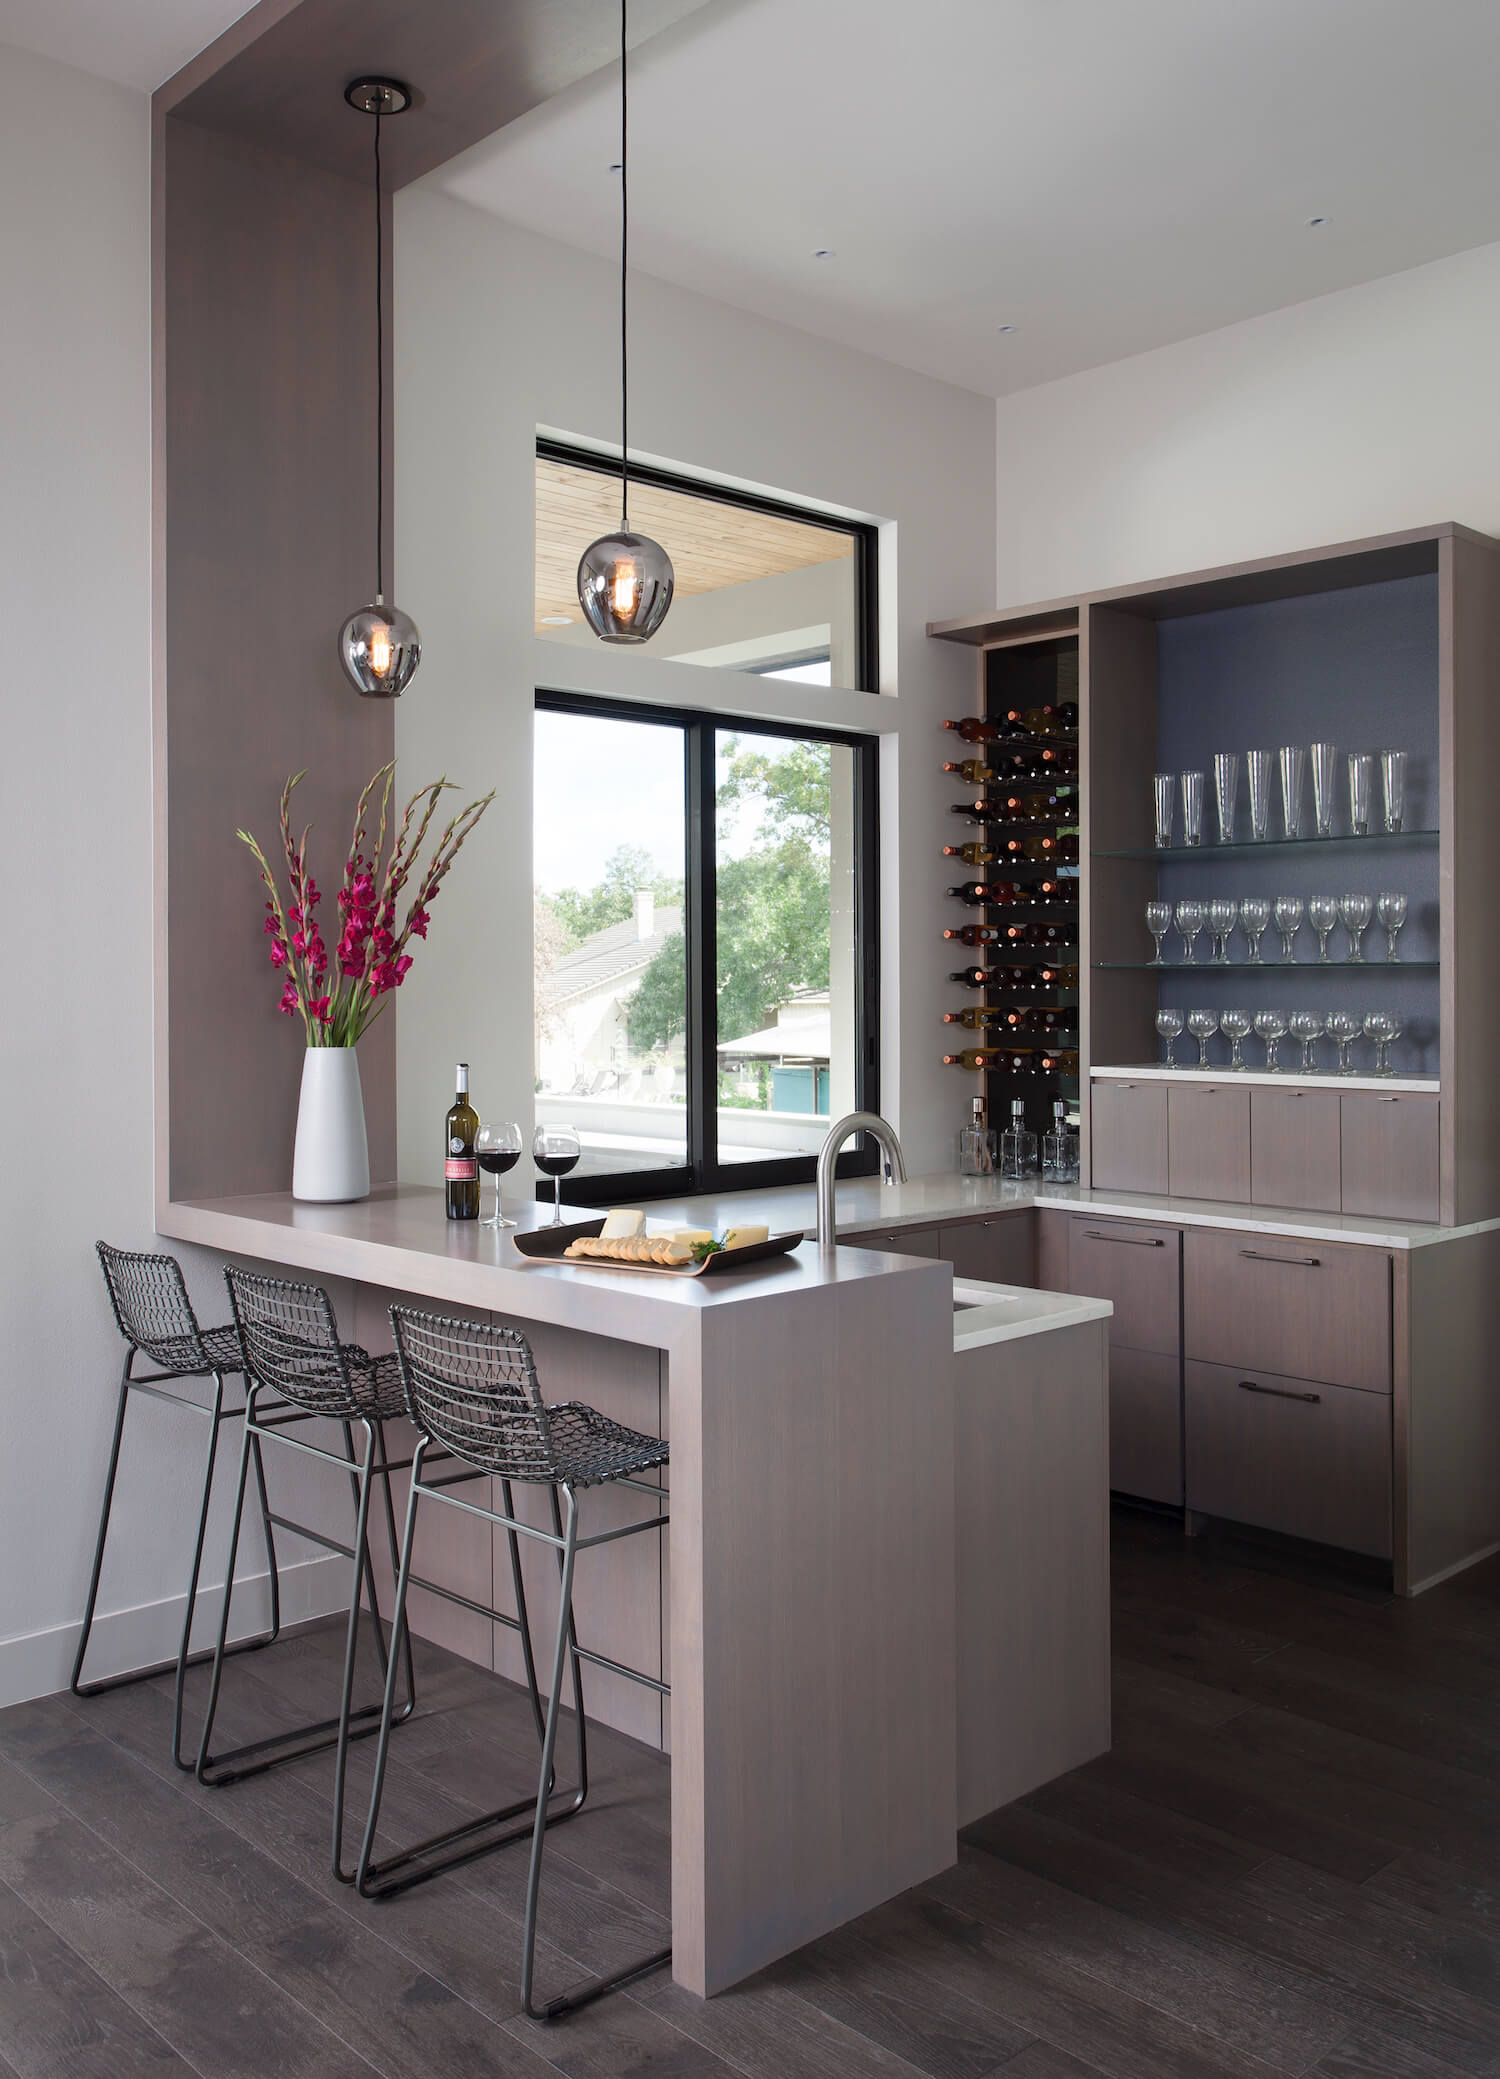 Horseshoe Bay Bar | Robin Colton Interior Design Studio Austin Texas | www.robincolton.com